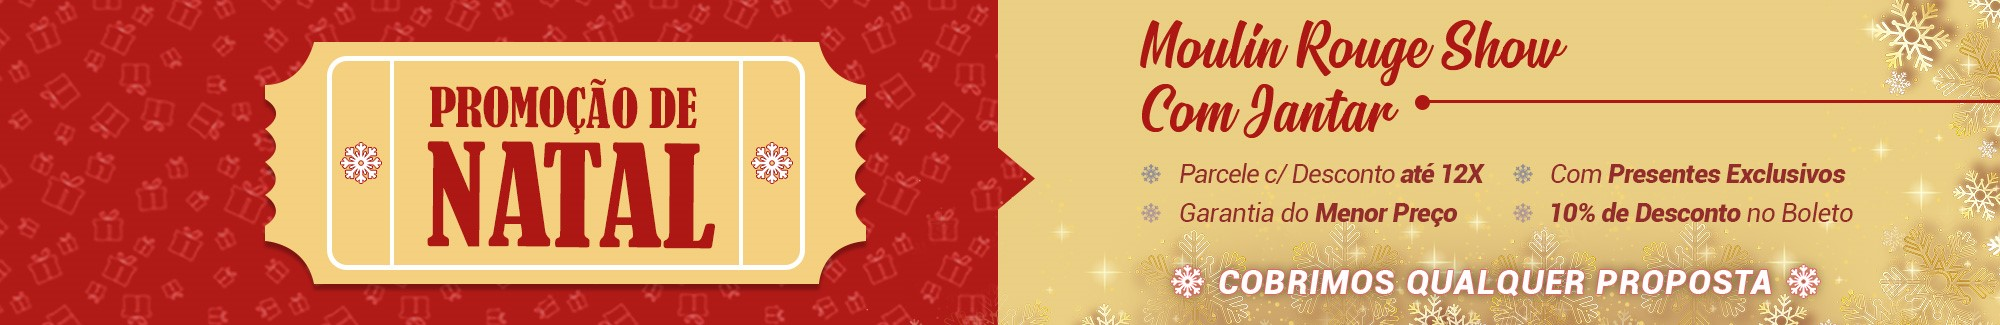 Moulin Rouge Show Natal